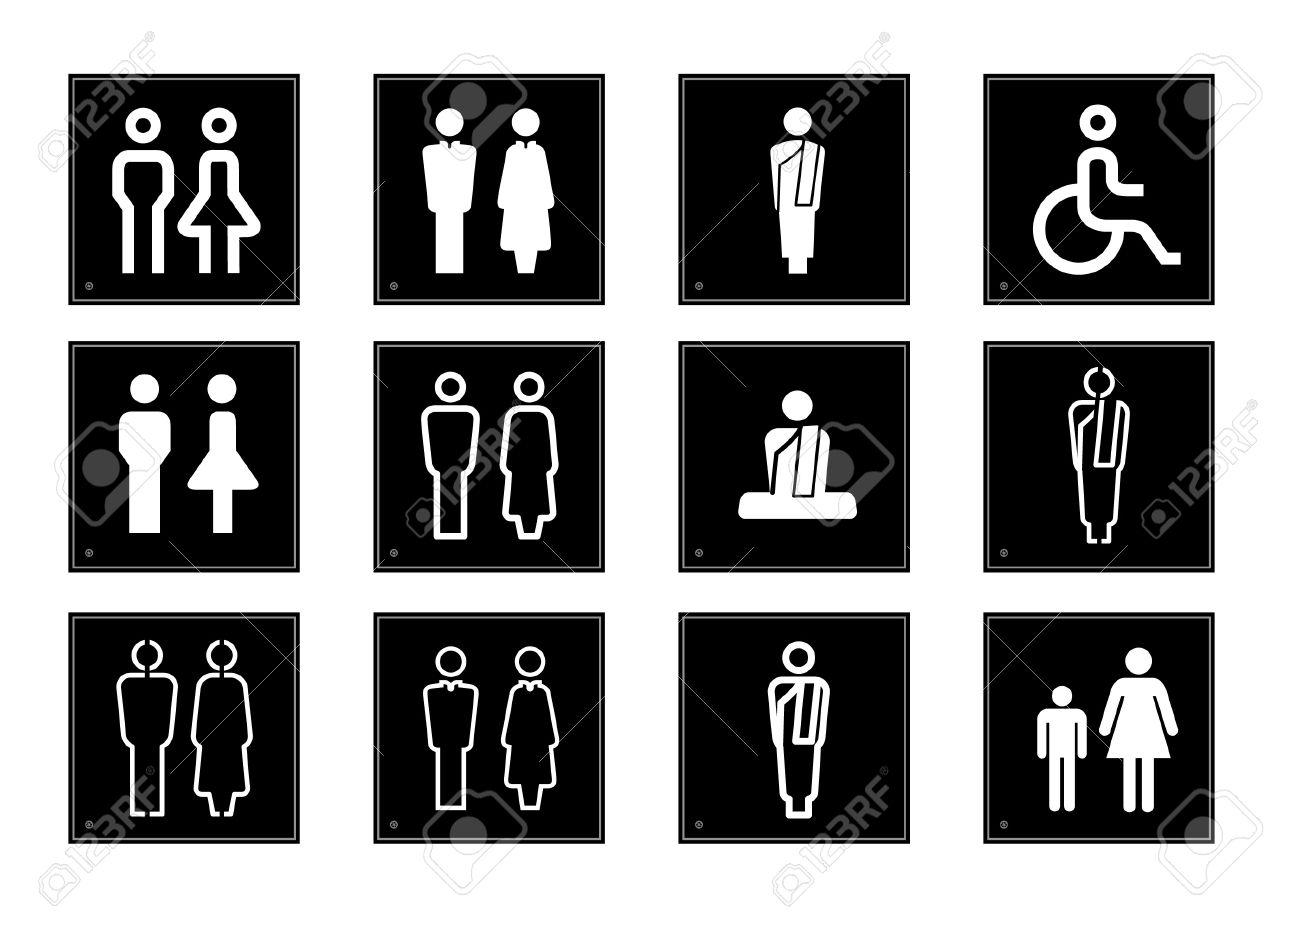 Toilet Symbols Illustration Royalty Free Cliparts Vectors And